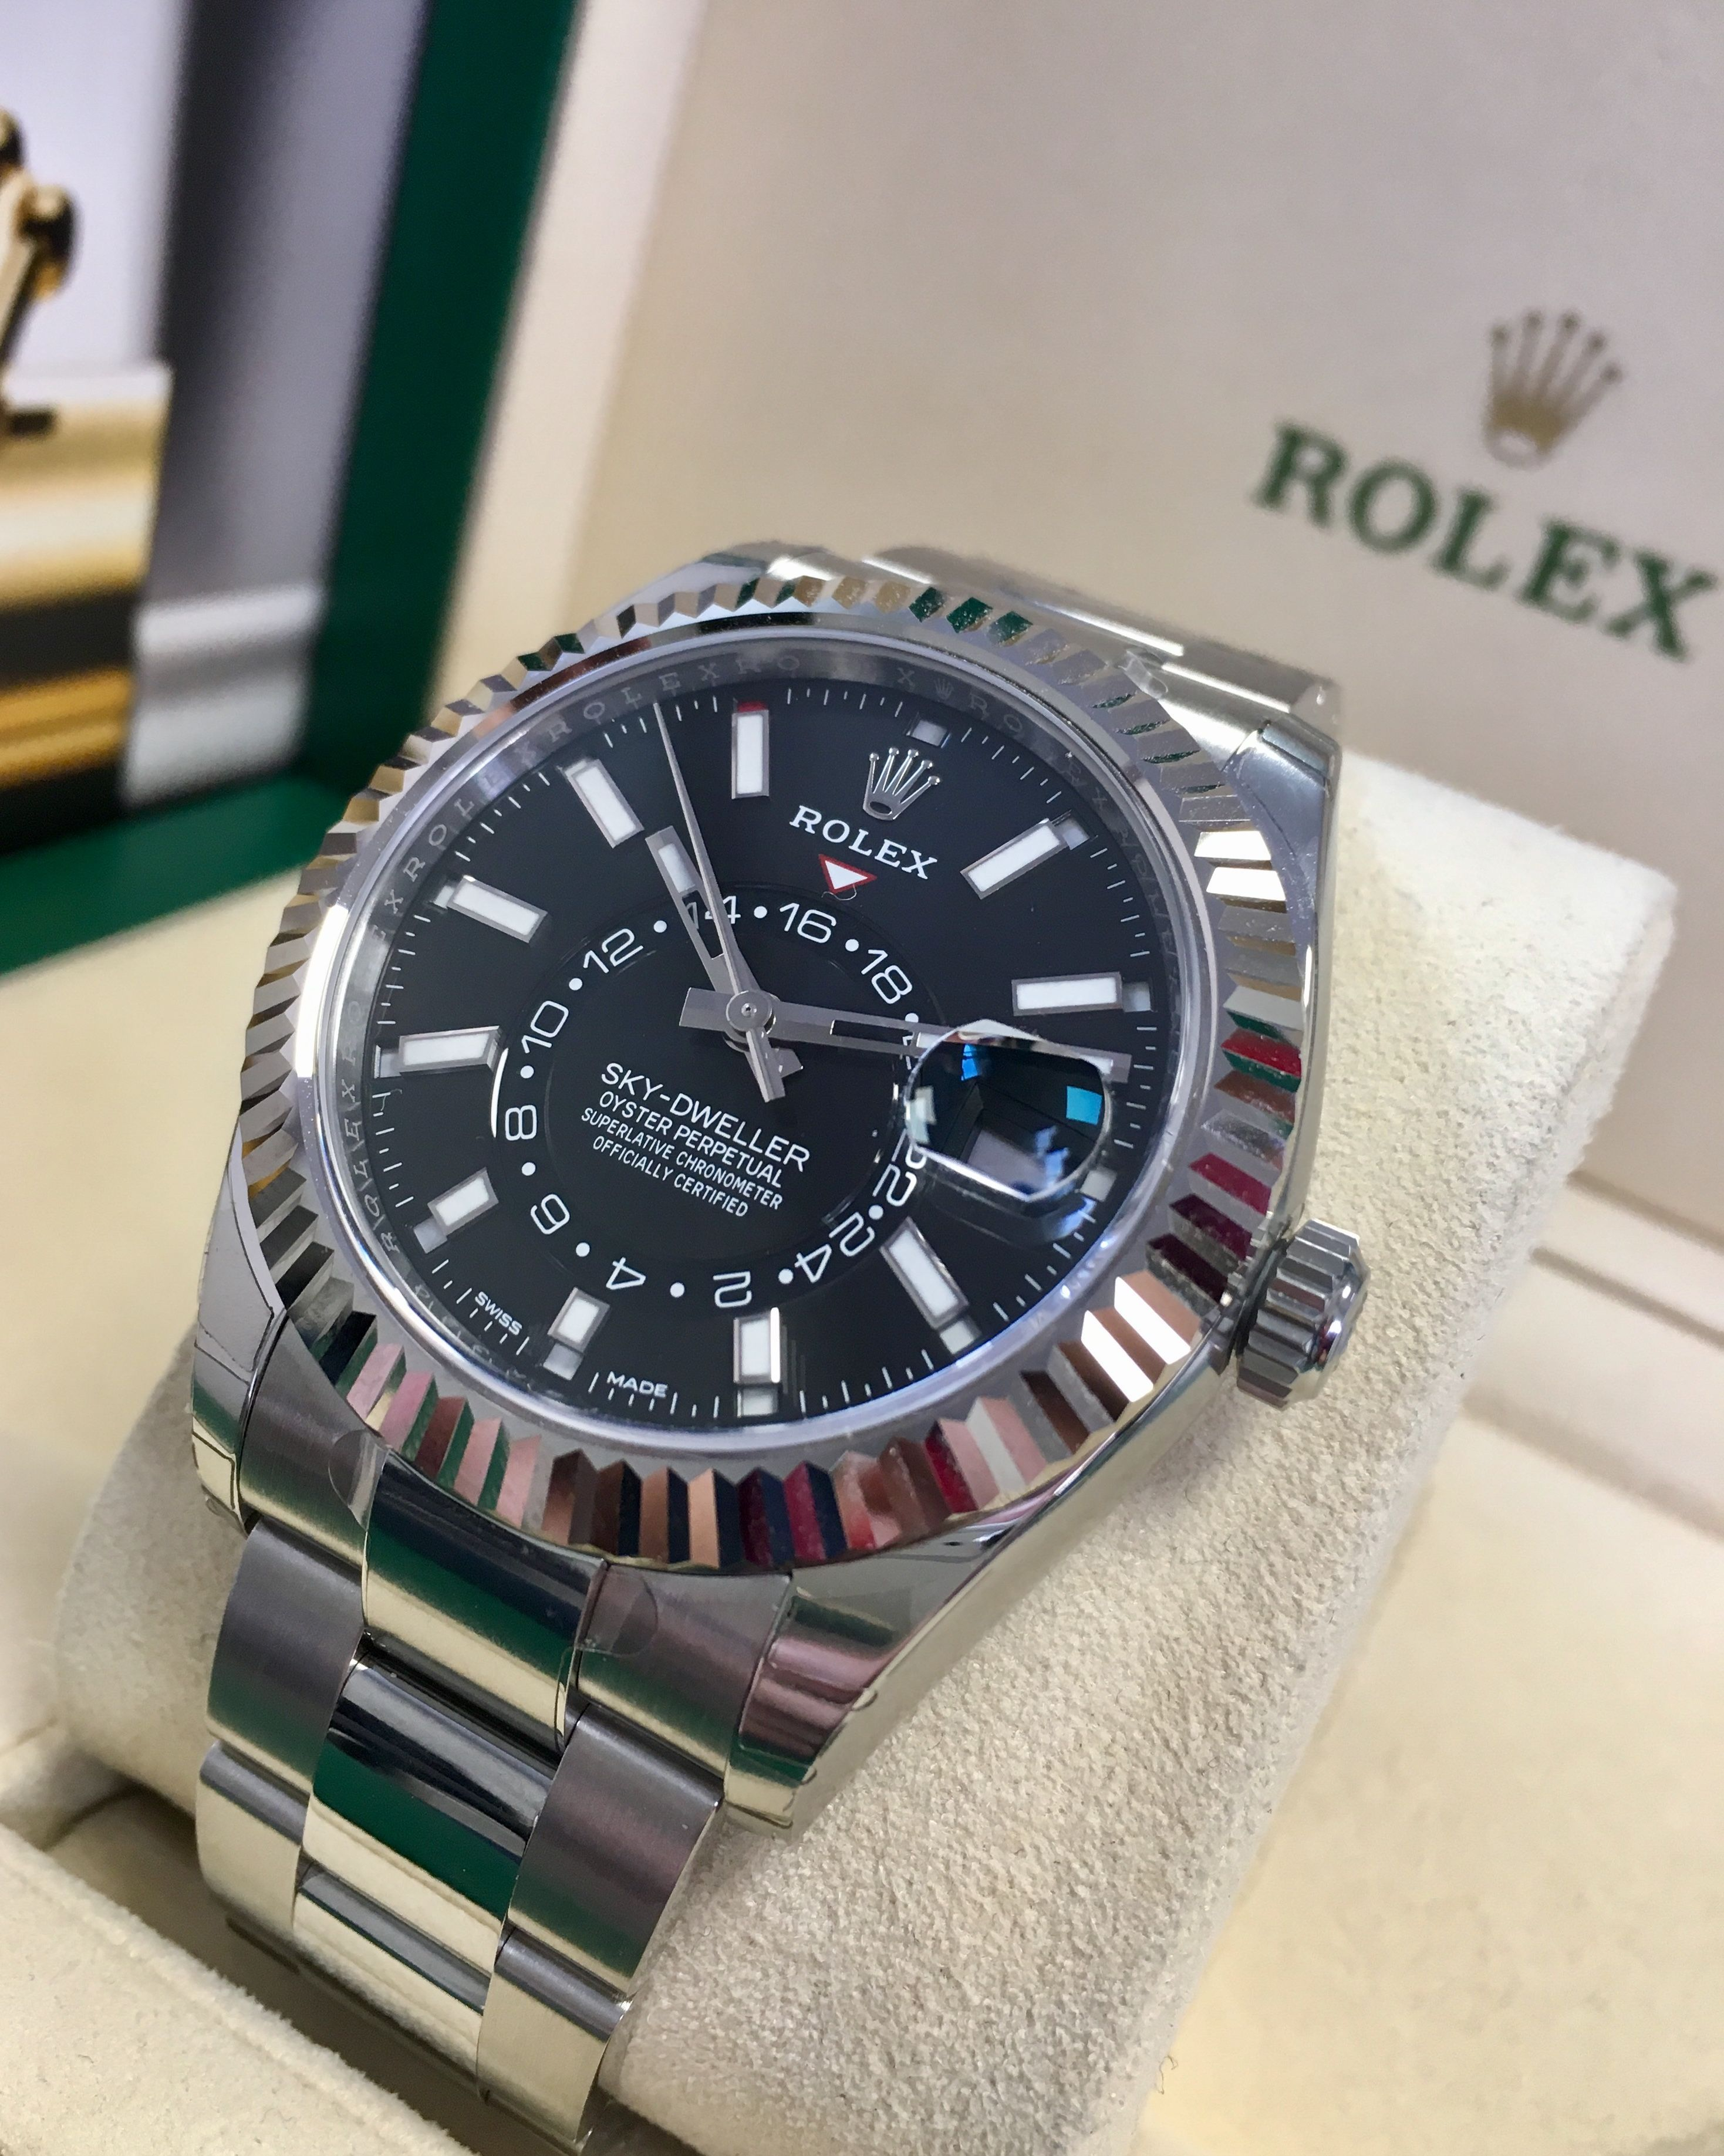 Rolex Sky Dweller Stainless Steel Black Dial 326934 Shop At Stylizio For Luxury Designer Handbags Rolex Watches Rolex Watches For Men Luxury Watches For Men